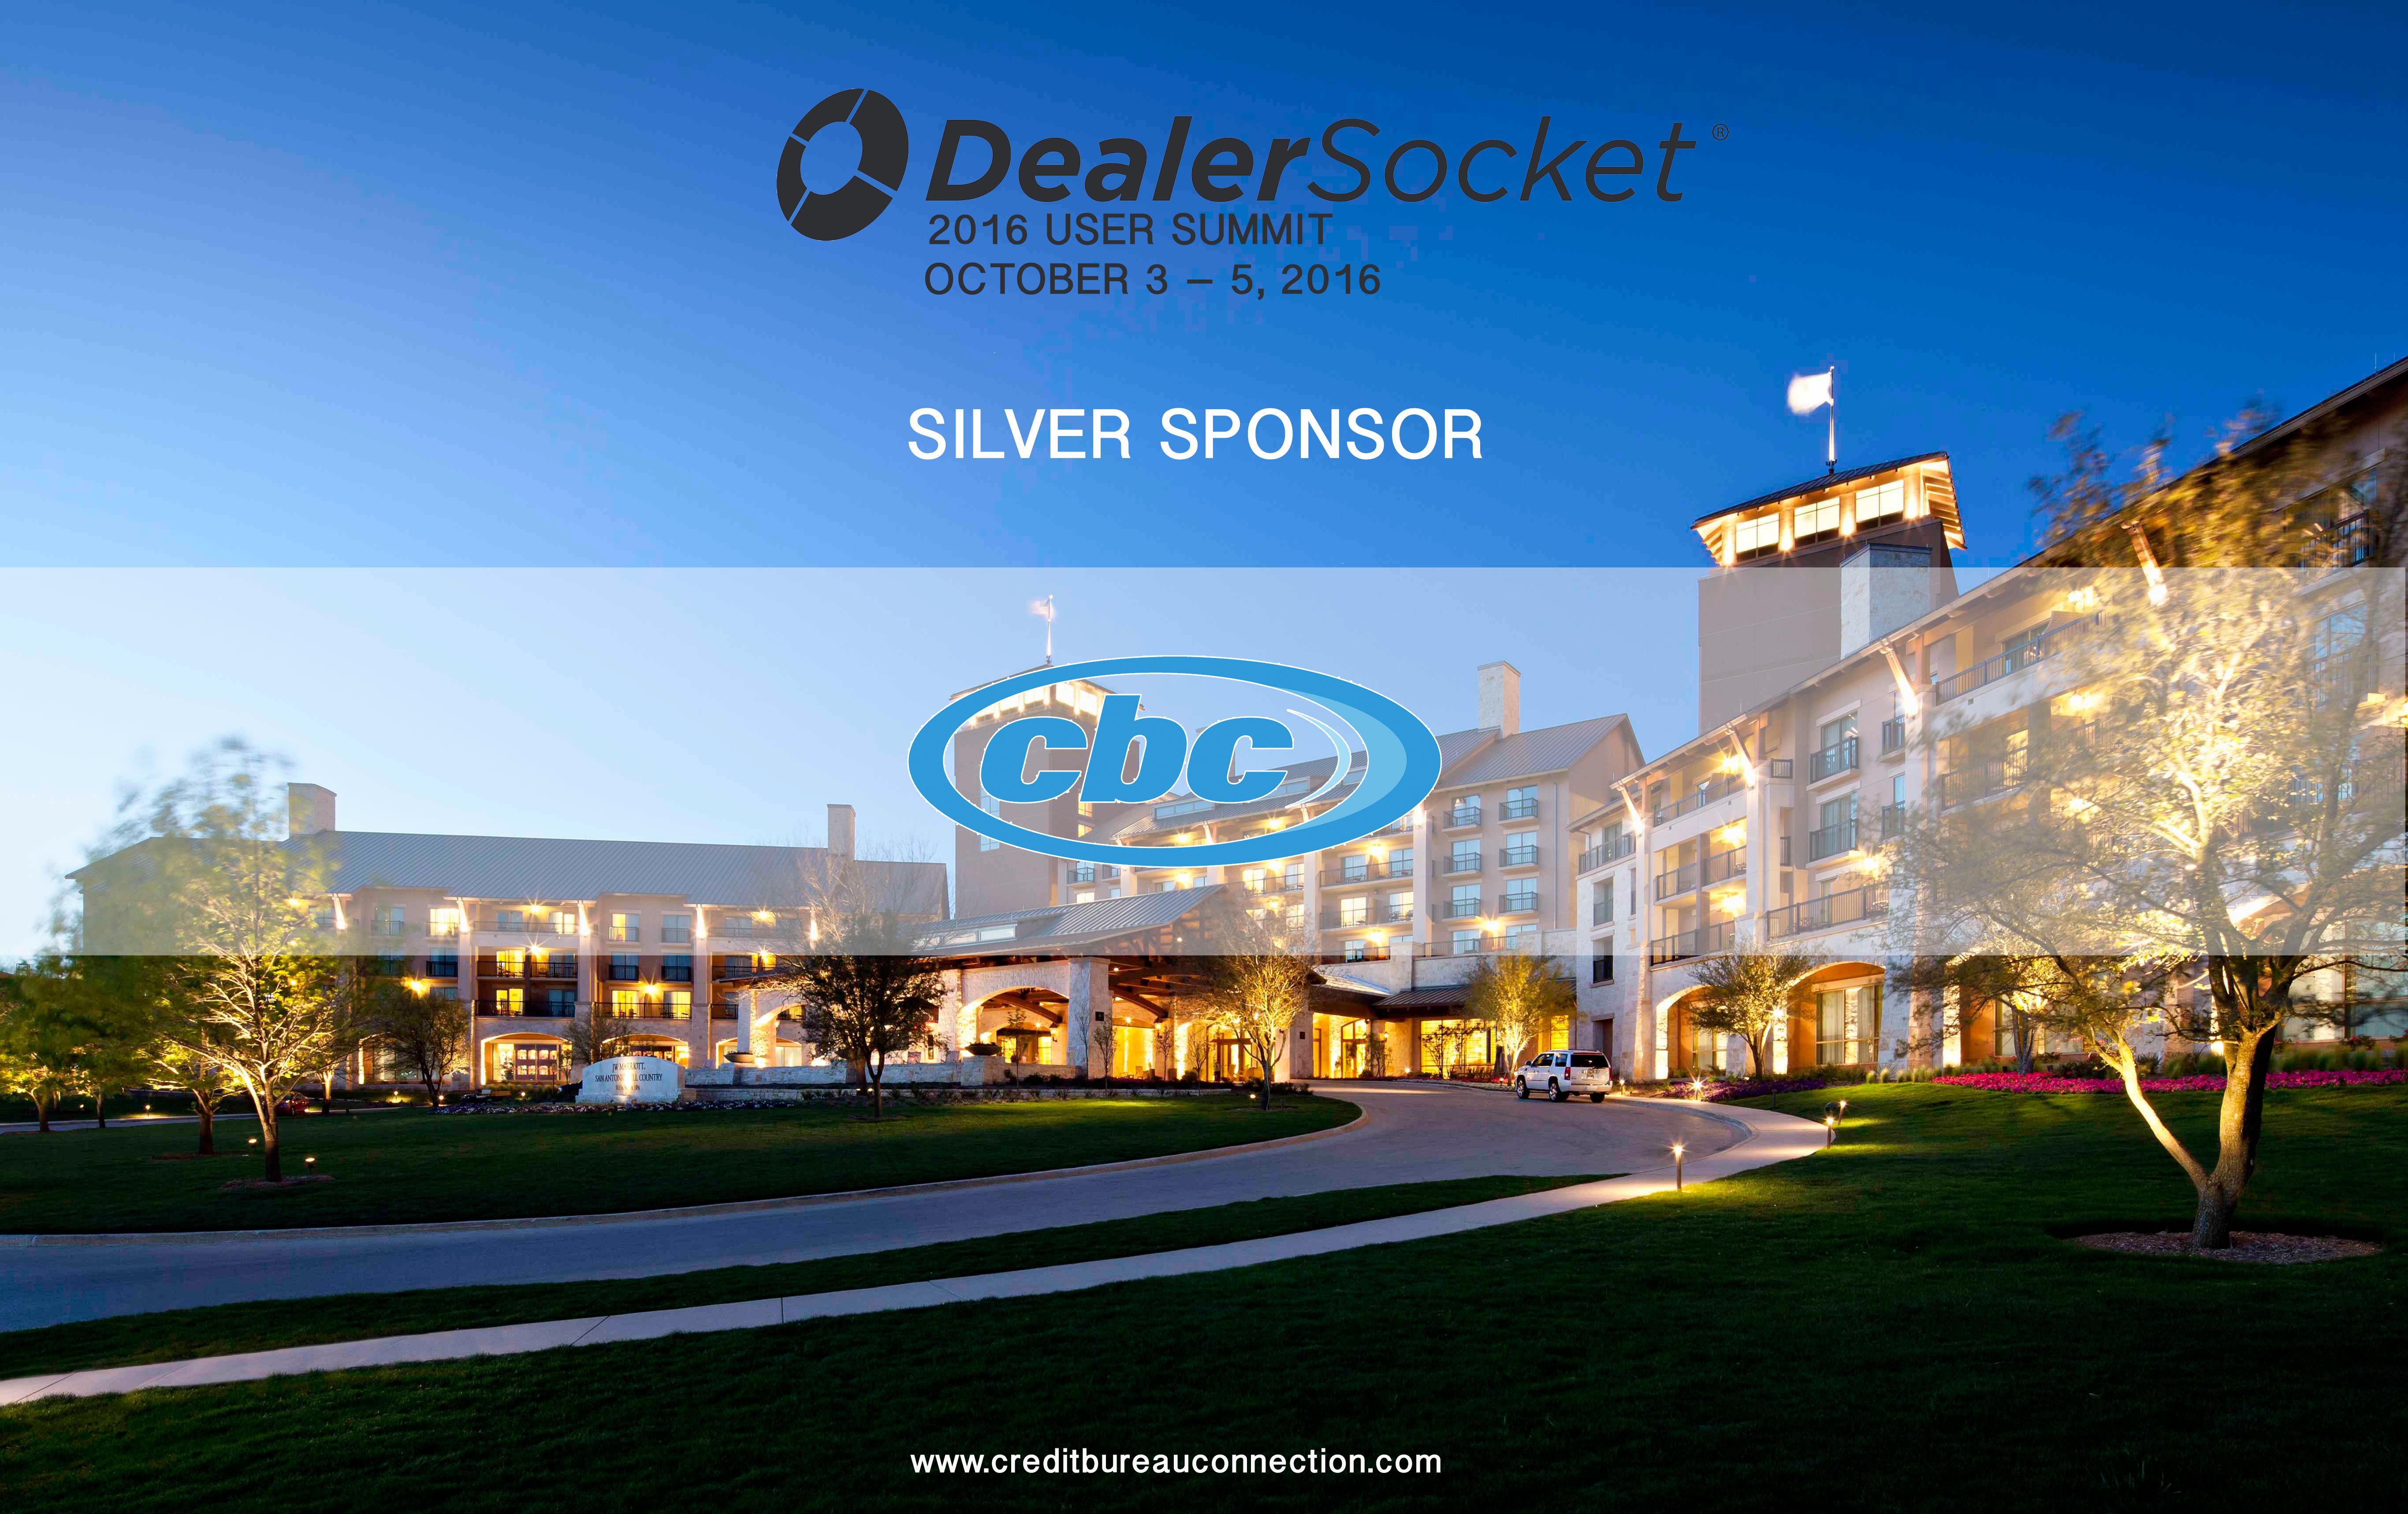 CBC Sponsors DealerSocket User Summit post thumbnail image